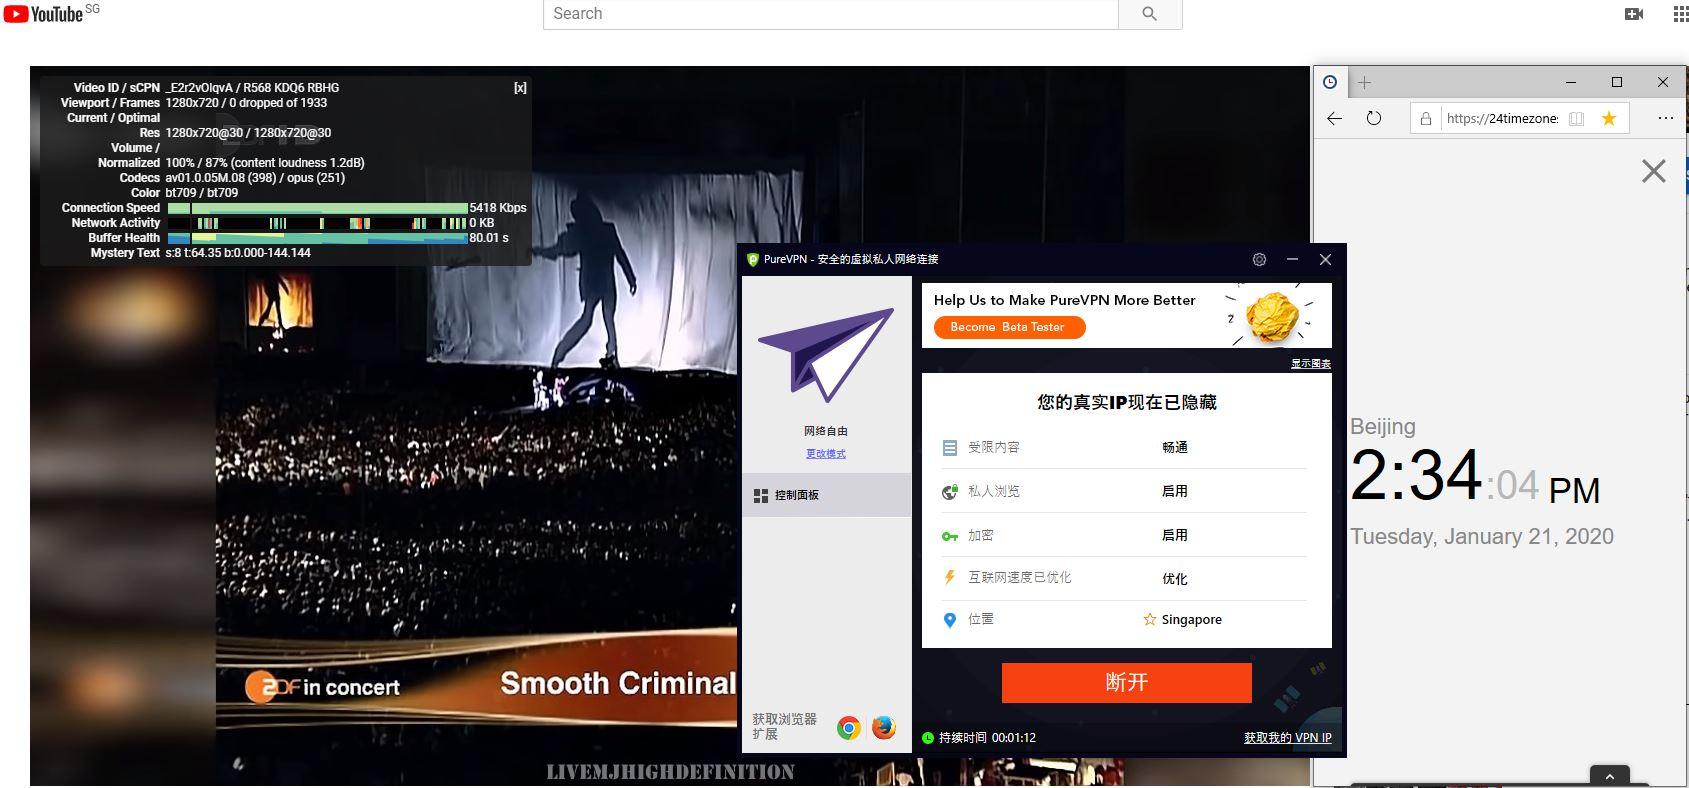 Windows10 StrongVPN Singapore 中国VPN翻墙 科学上网 Youtube测速-20200121